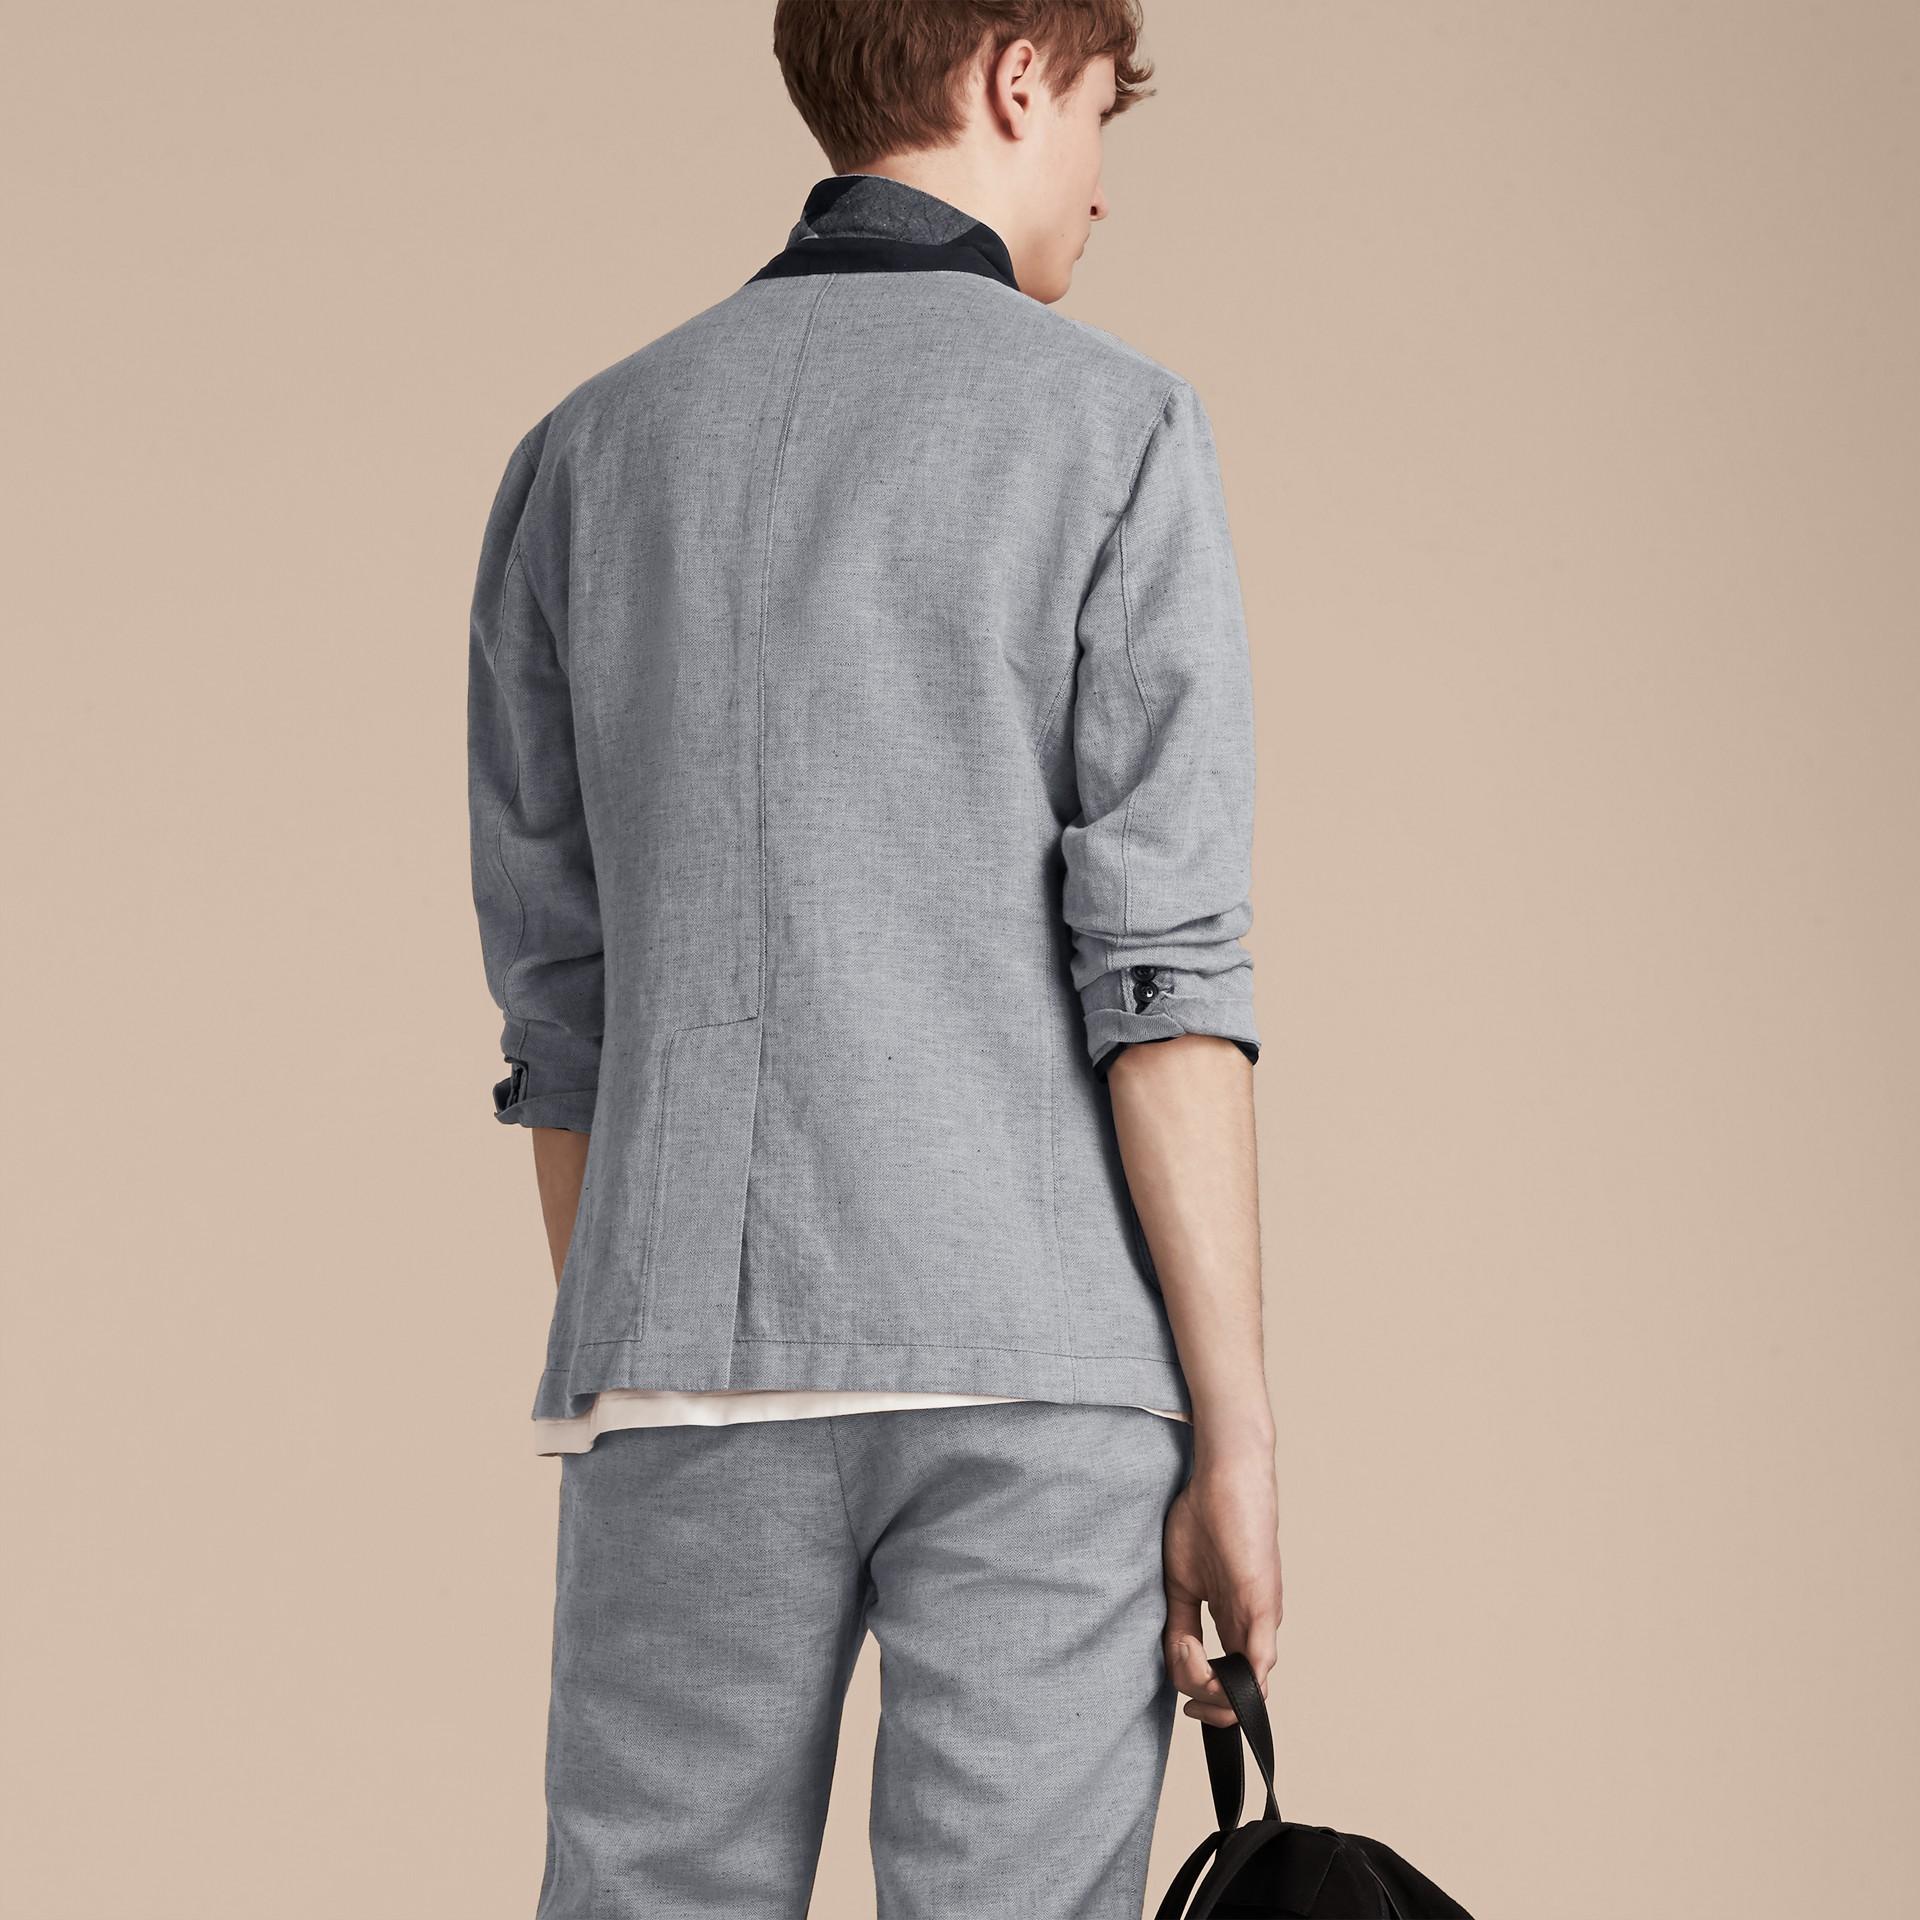 Pale blue Herringbone Linen Cotton Tailored Jacket Pale Blue - gallery image 3